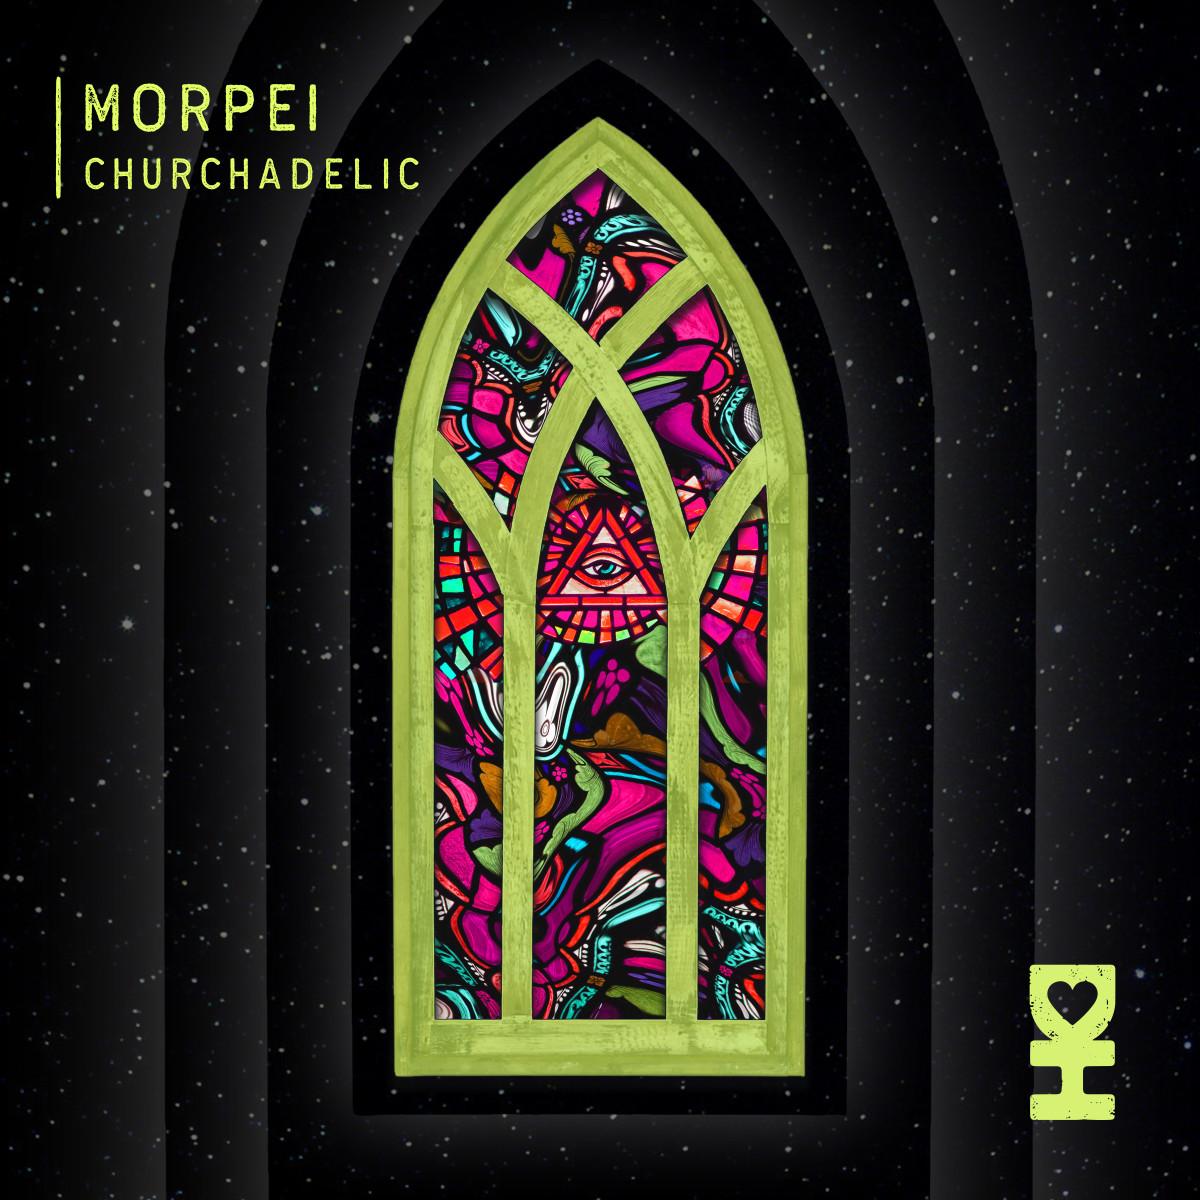 Churchadelic EP by Morpei on Desert Hearts